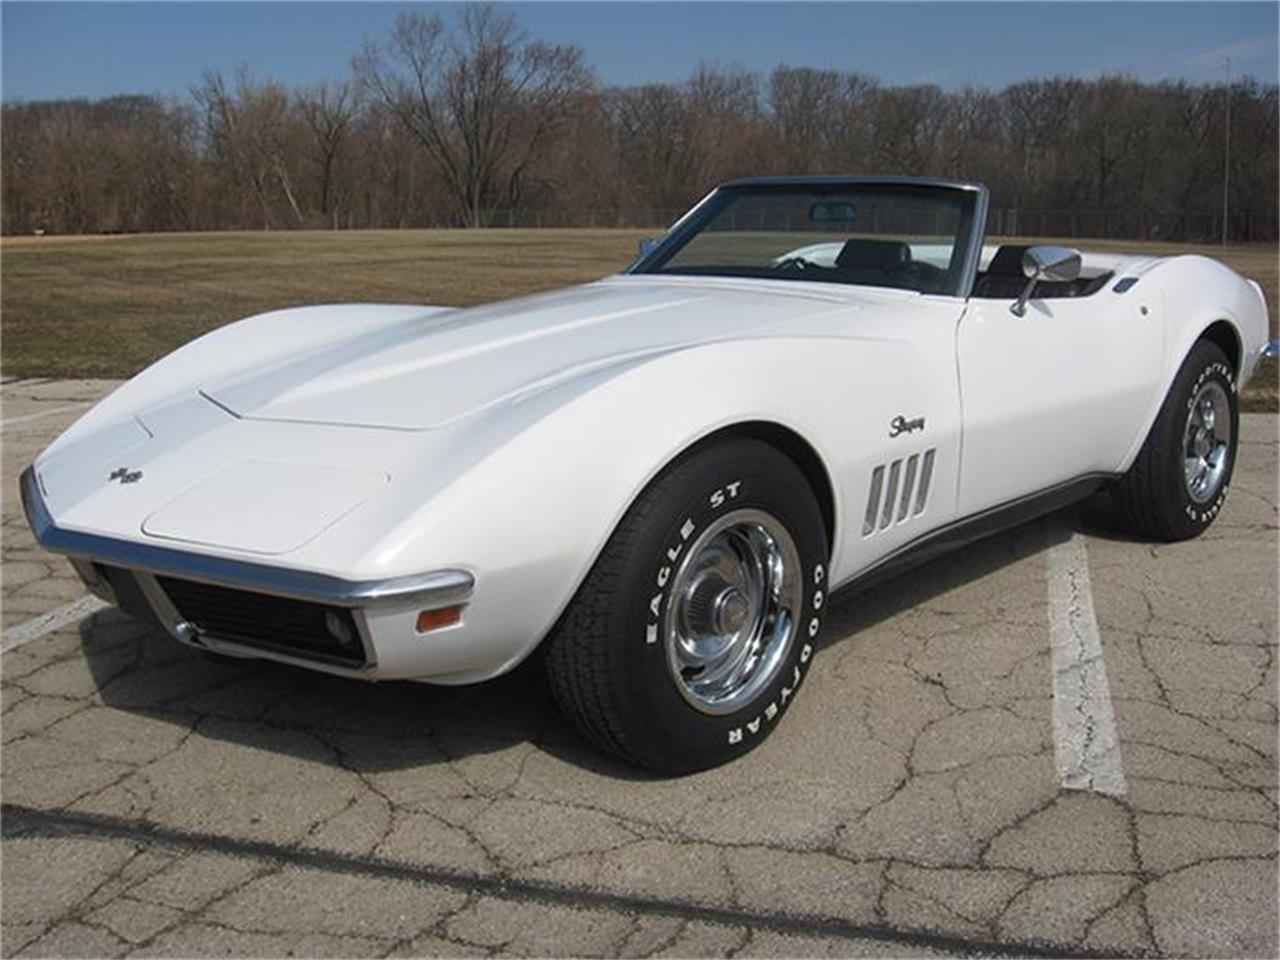 1969 Corvette Stingray >> 1969 Chevrolet Corvette Stingray For Sale Classiccars Com